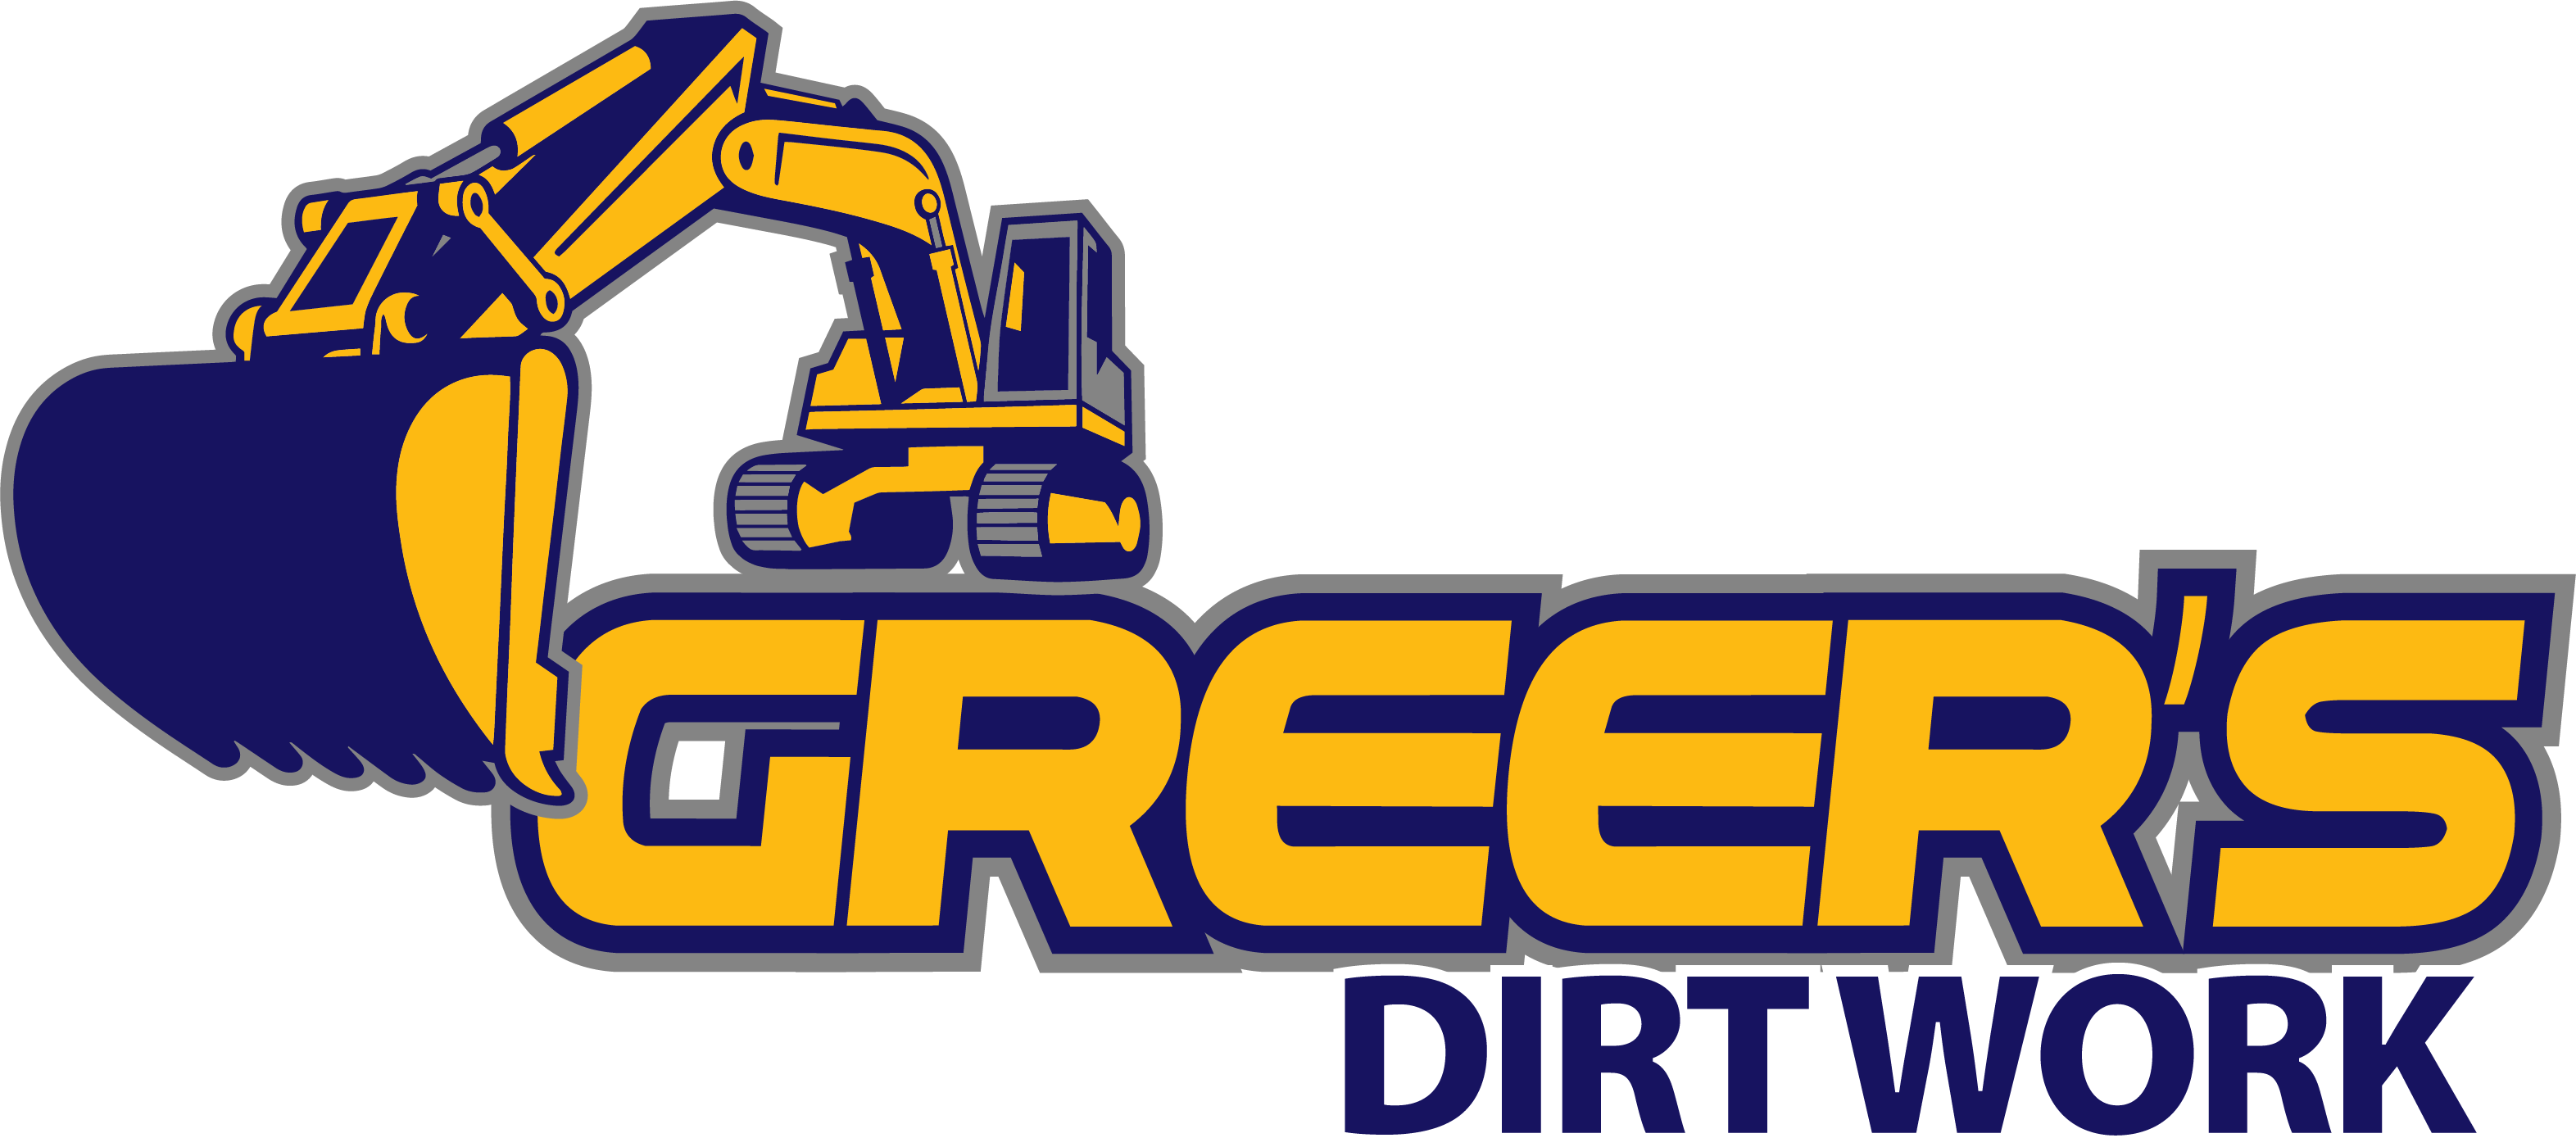 Work land clearing shreveport. Dirt clipart construction dirt